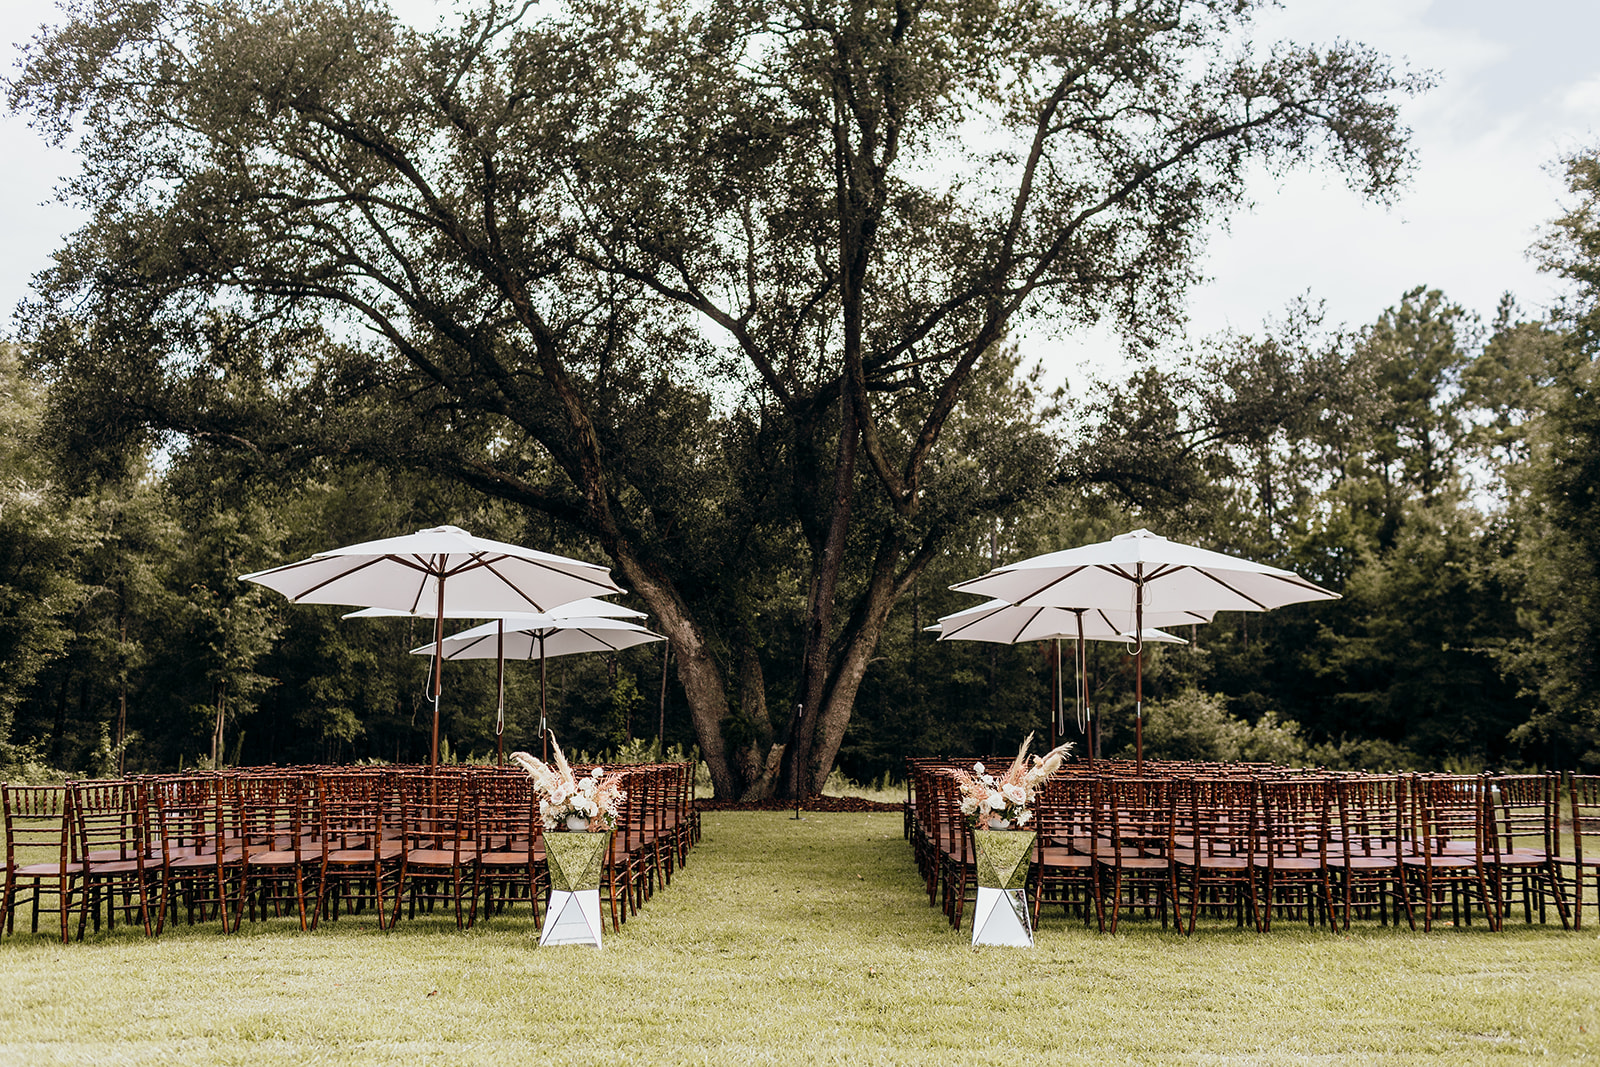 Casey-Josh-Pearl-In-The-Wild-Tallahassee-Wedding-94_websize.jpg